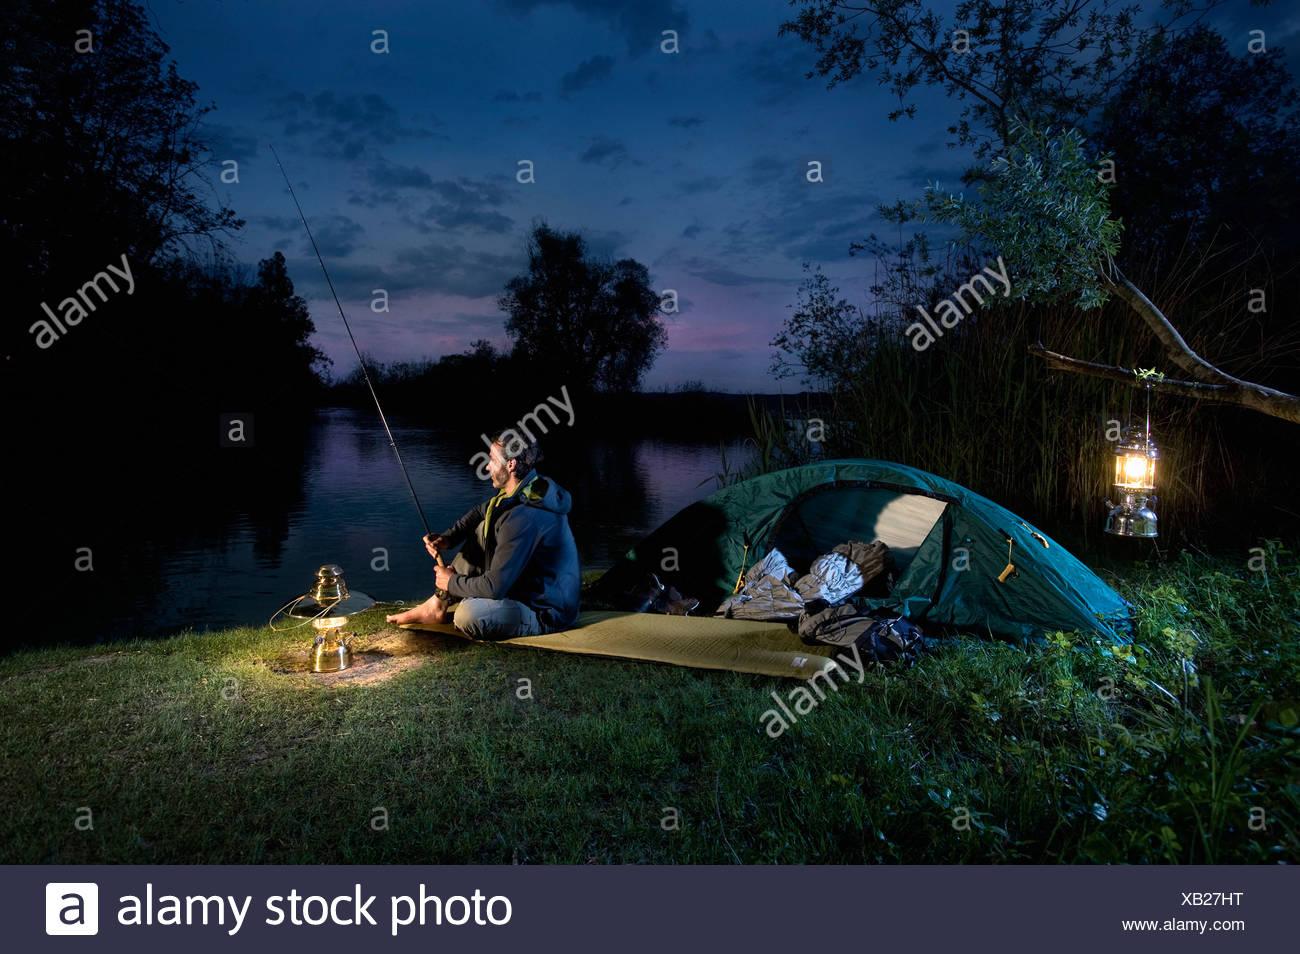 Germany, Bavaria, Ammersee, Man sitting near lakeshore with lantern and fishing at dusk - Stock Image